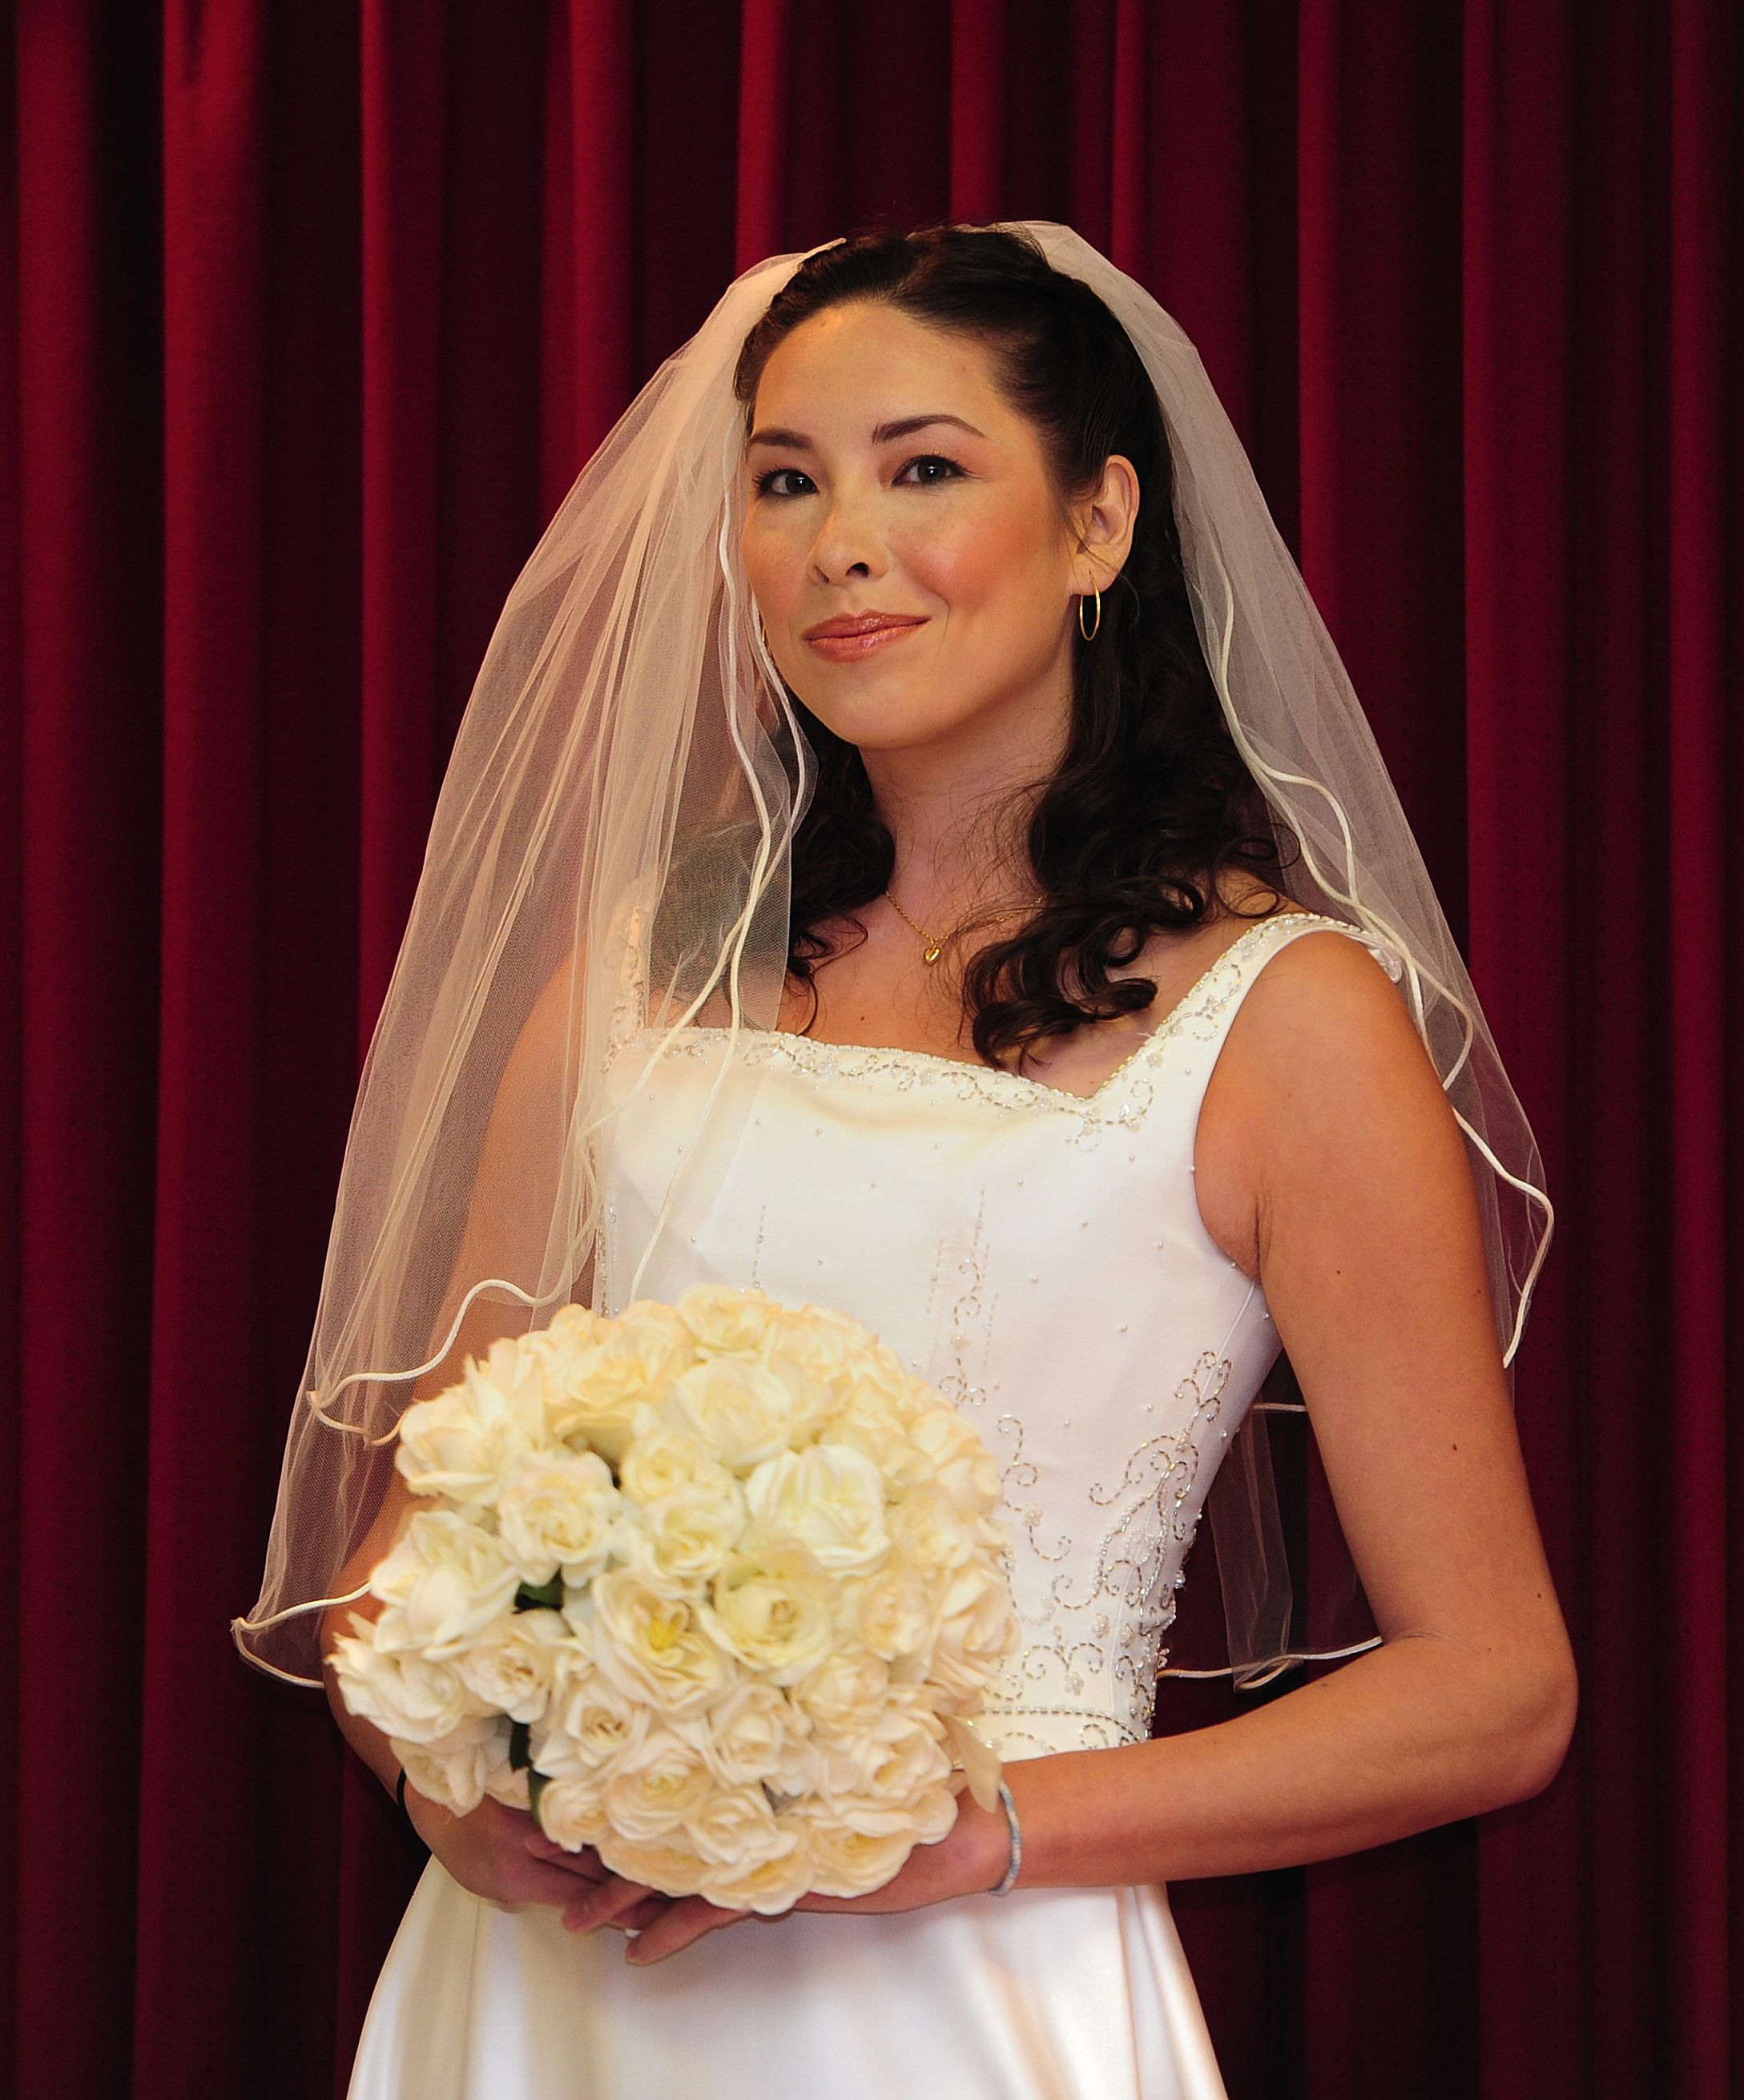 Lace wedding dress under 300  Pin by Ashleigh Buyers on Modest Catholic Wedding Dresses  Pinterest